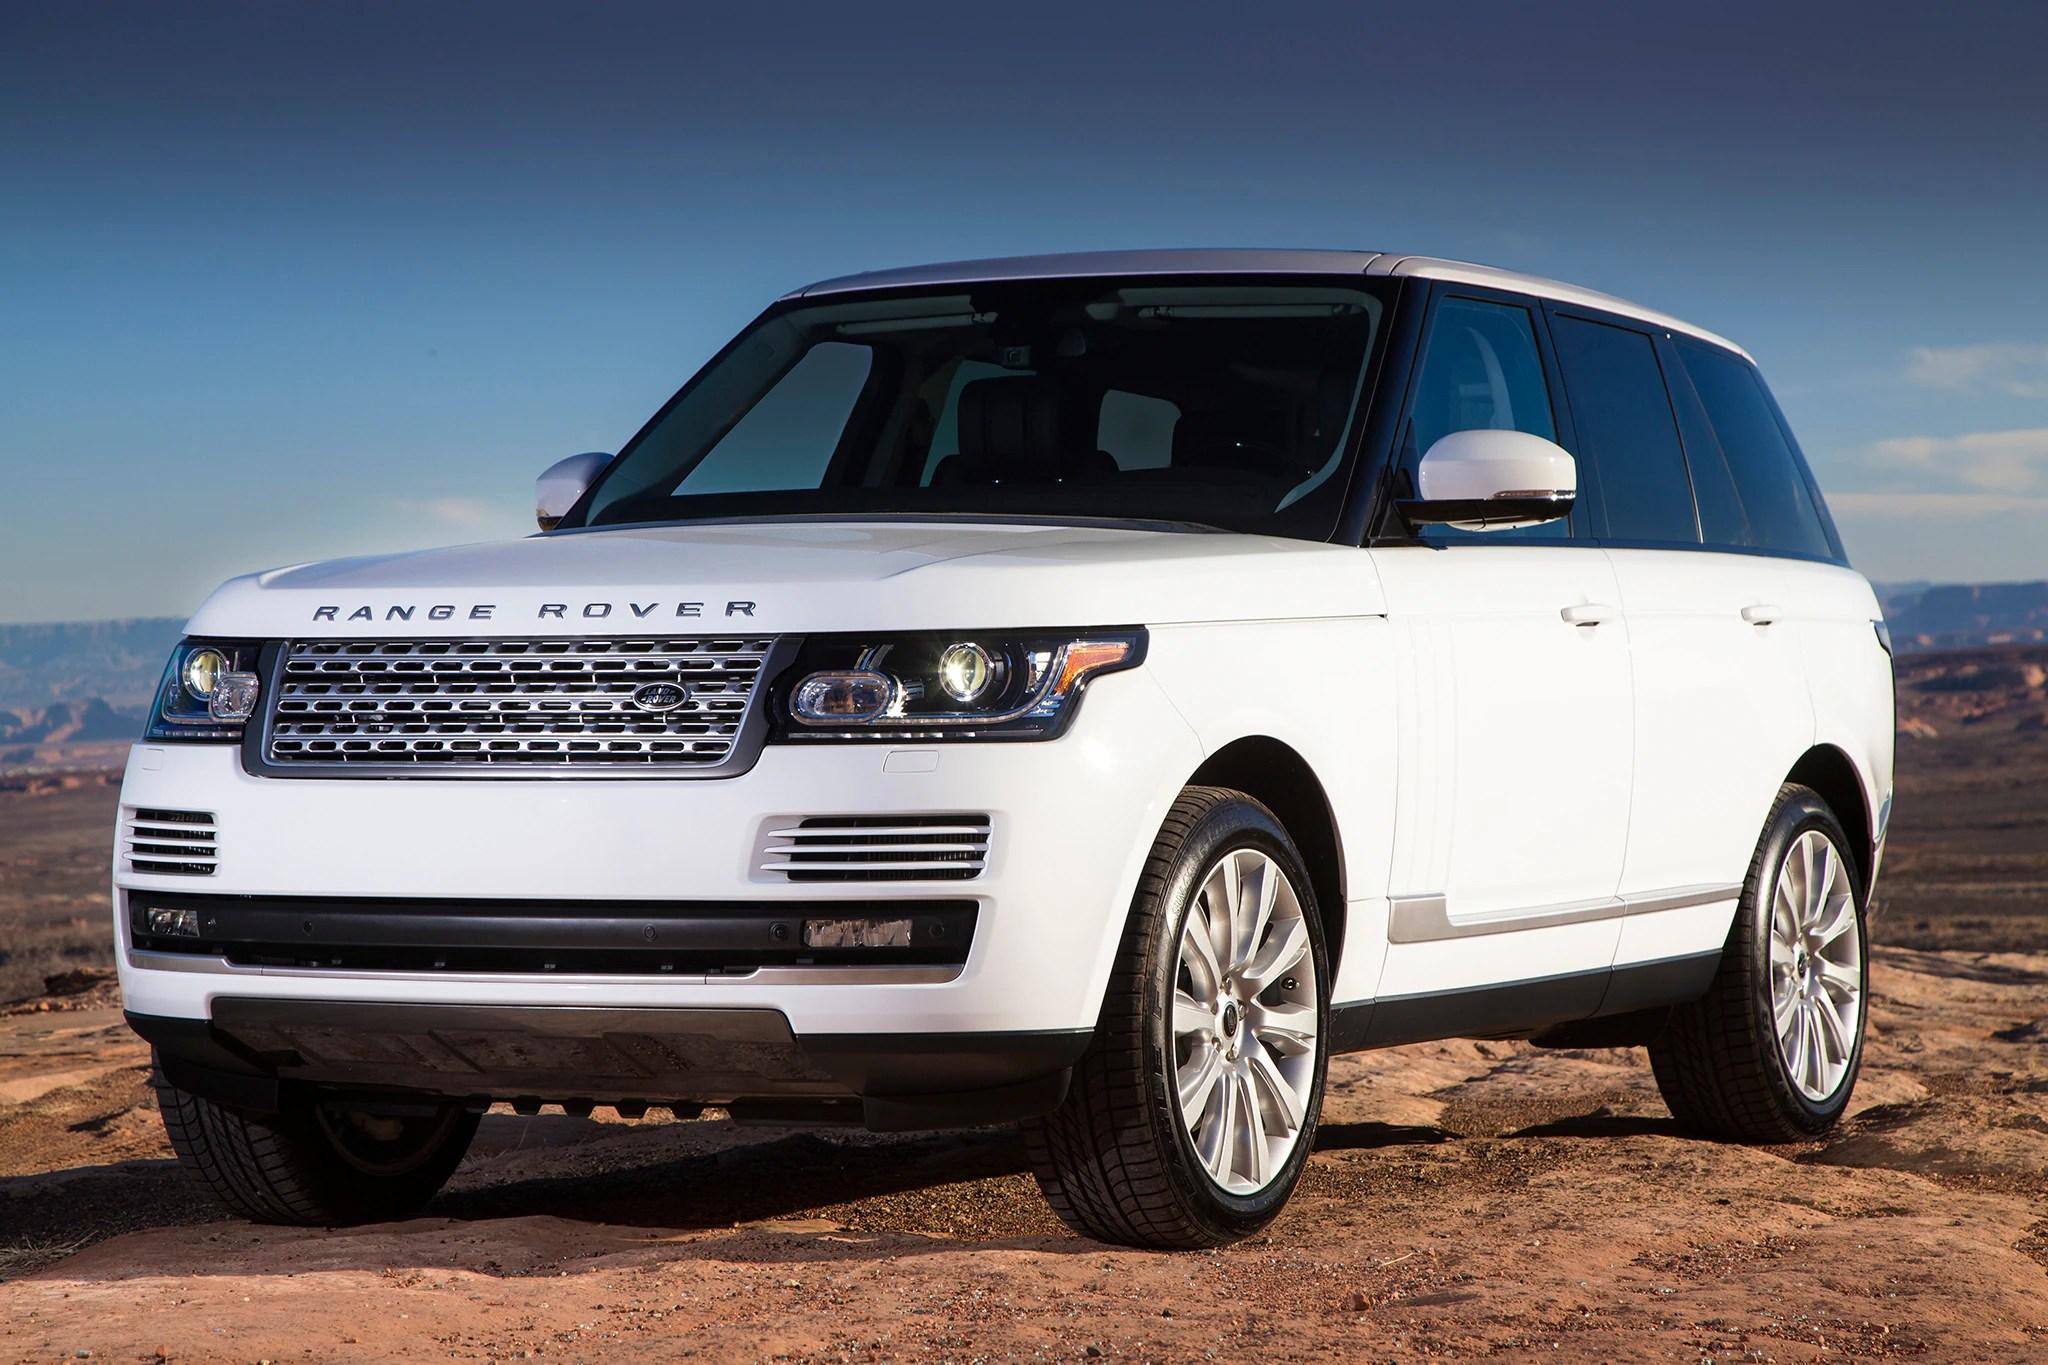 2013 Range Rover Gets Aggressive Transformation By Lumma Design